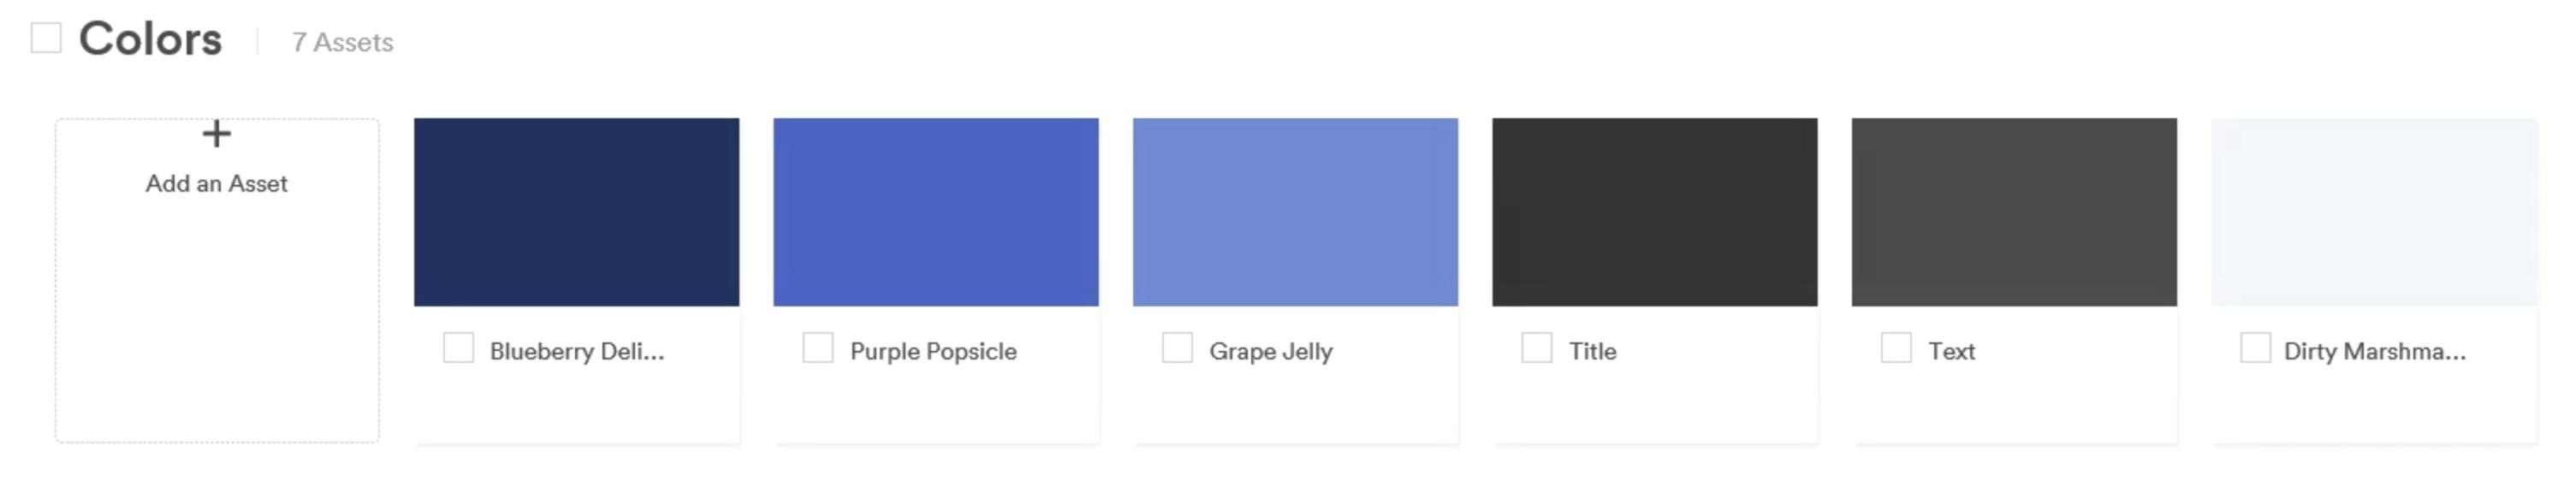 CSS grid no fallback example